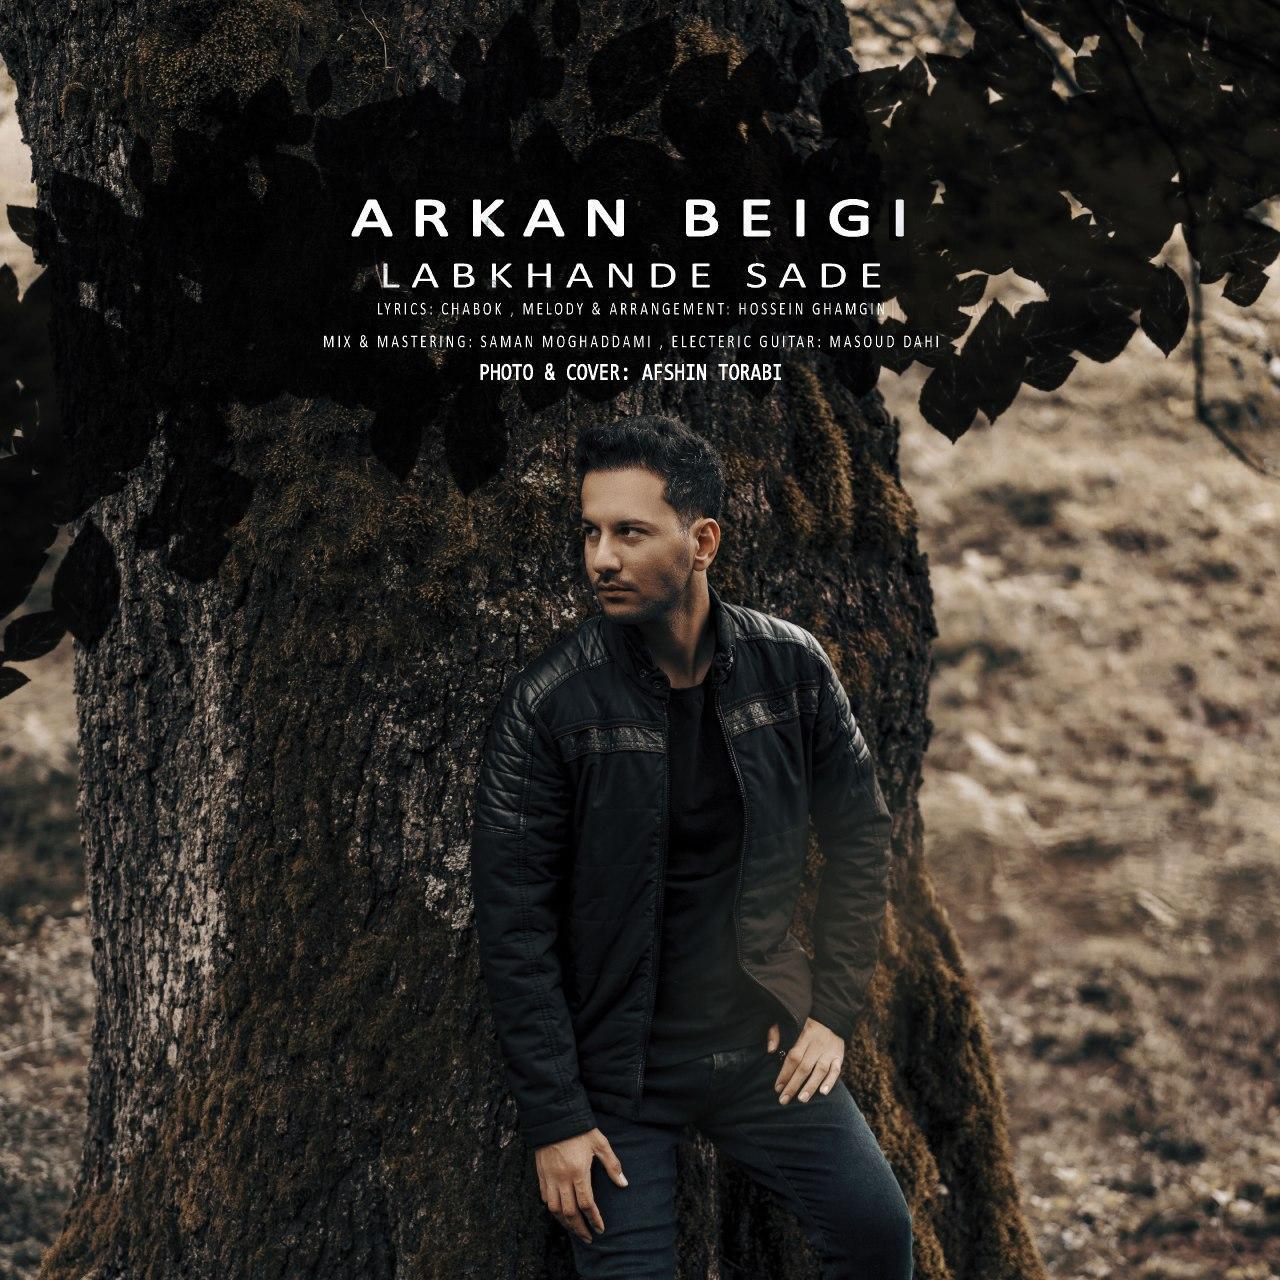 Arkan Beigi – Labkhande Sade